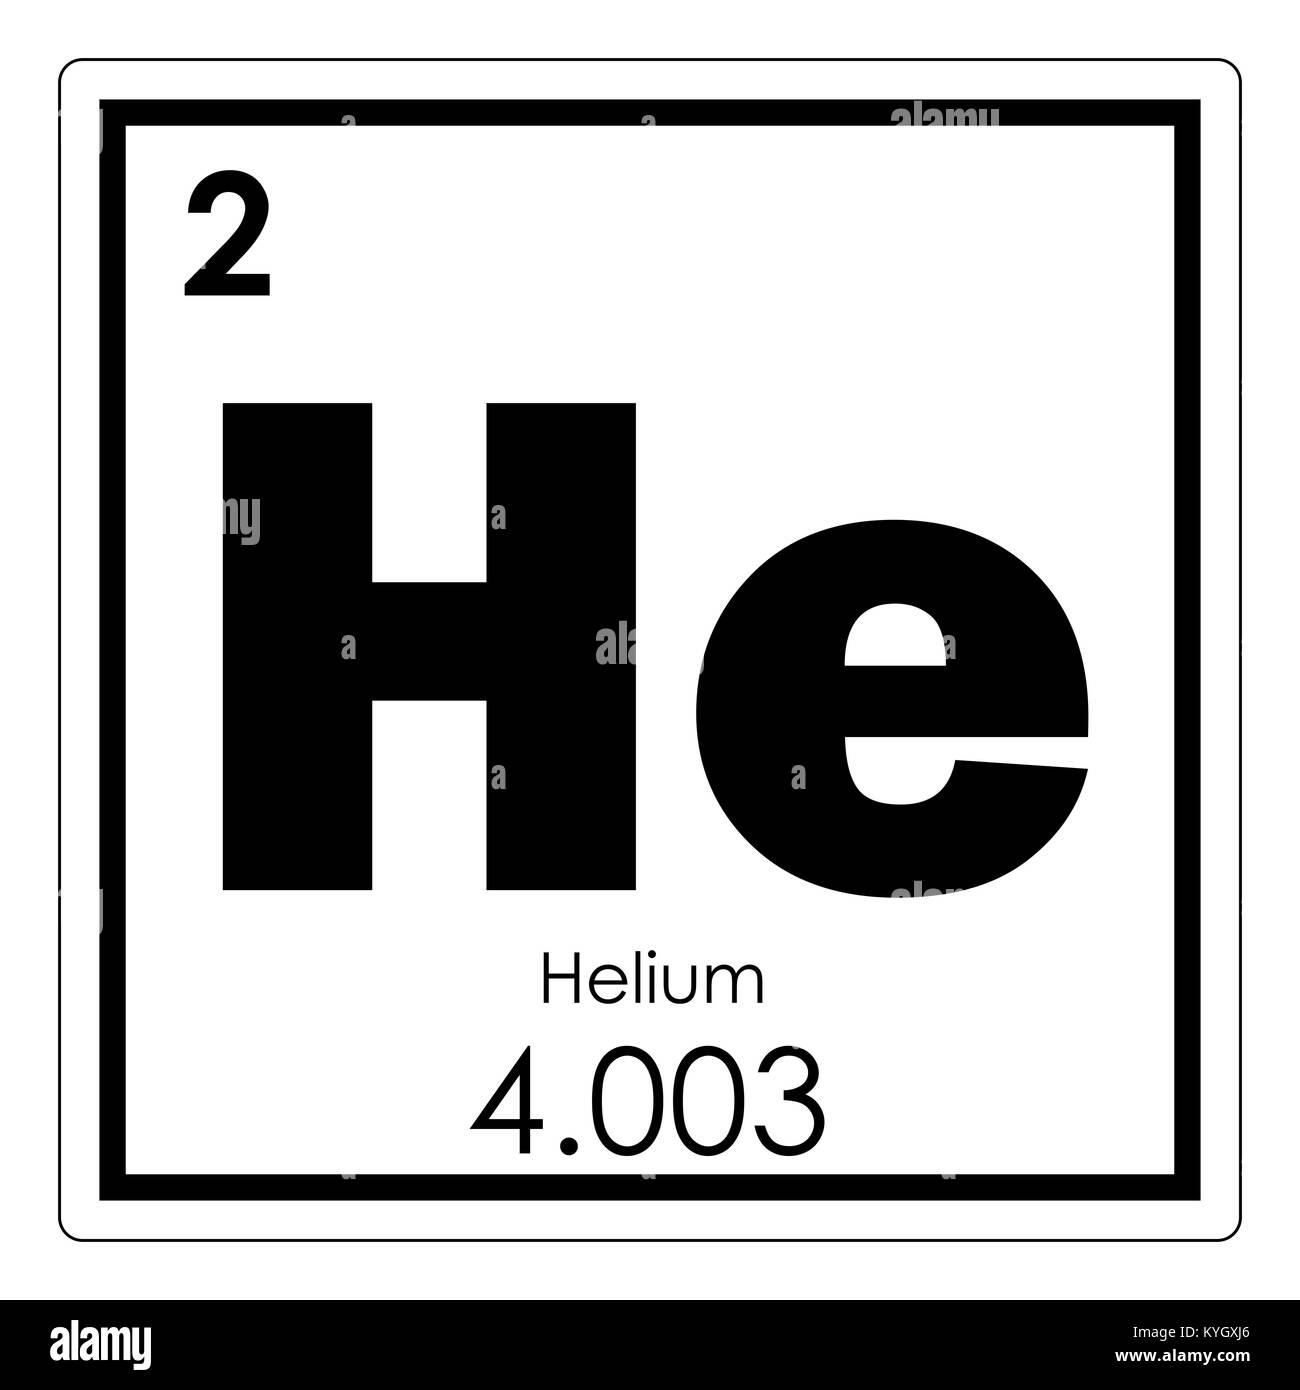 Helium Atom Stock Photos Helium Atom Stock Images Alamy